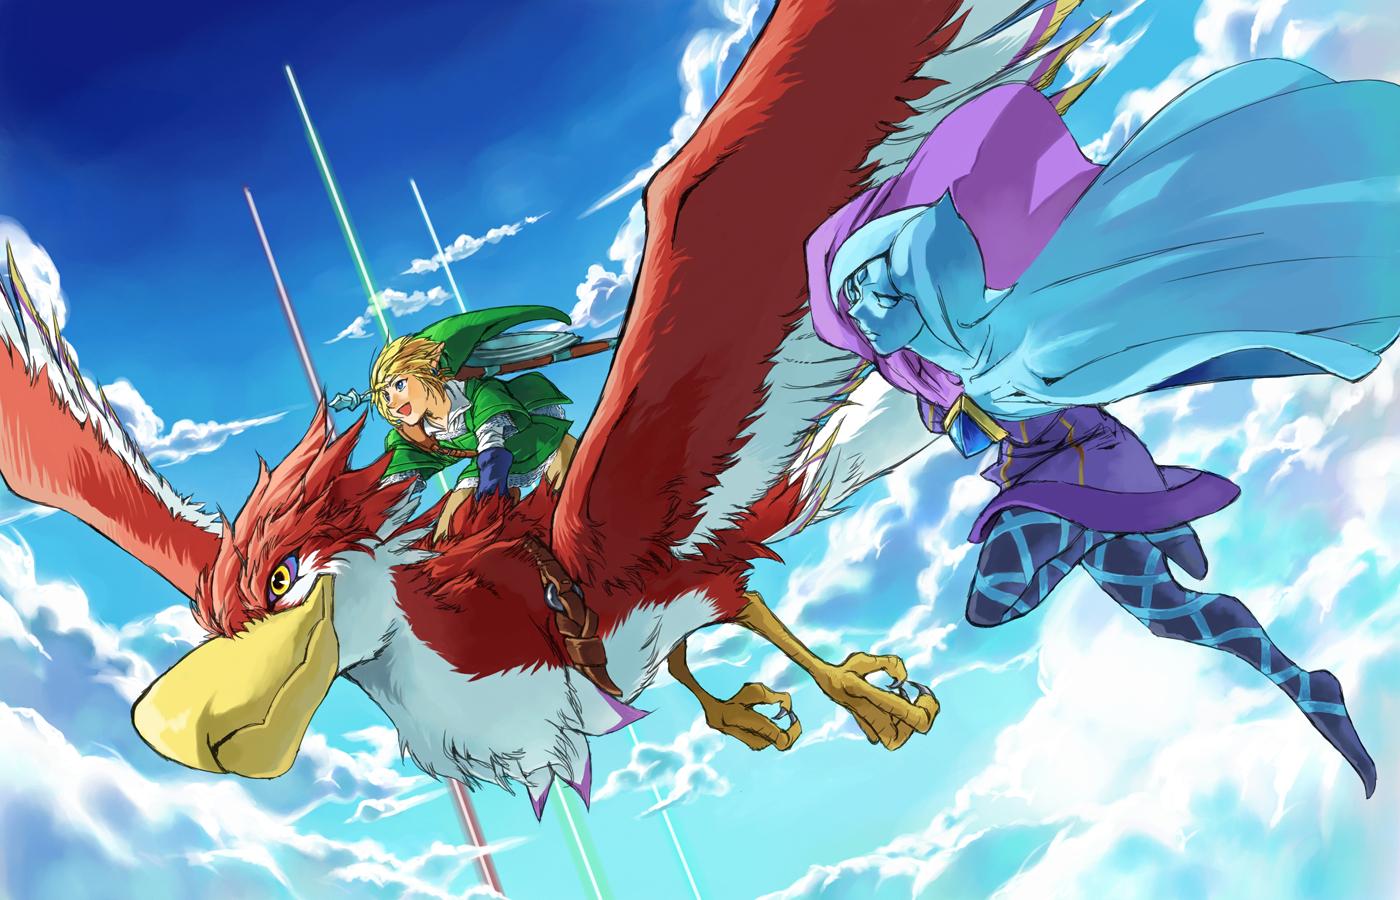 Zelda no Densetsu: Skyward Sword Image #1812368 - Zerochan ...